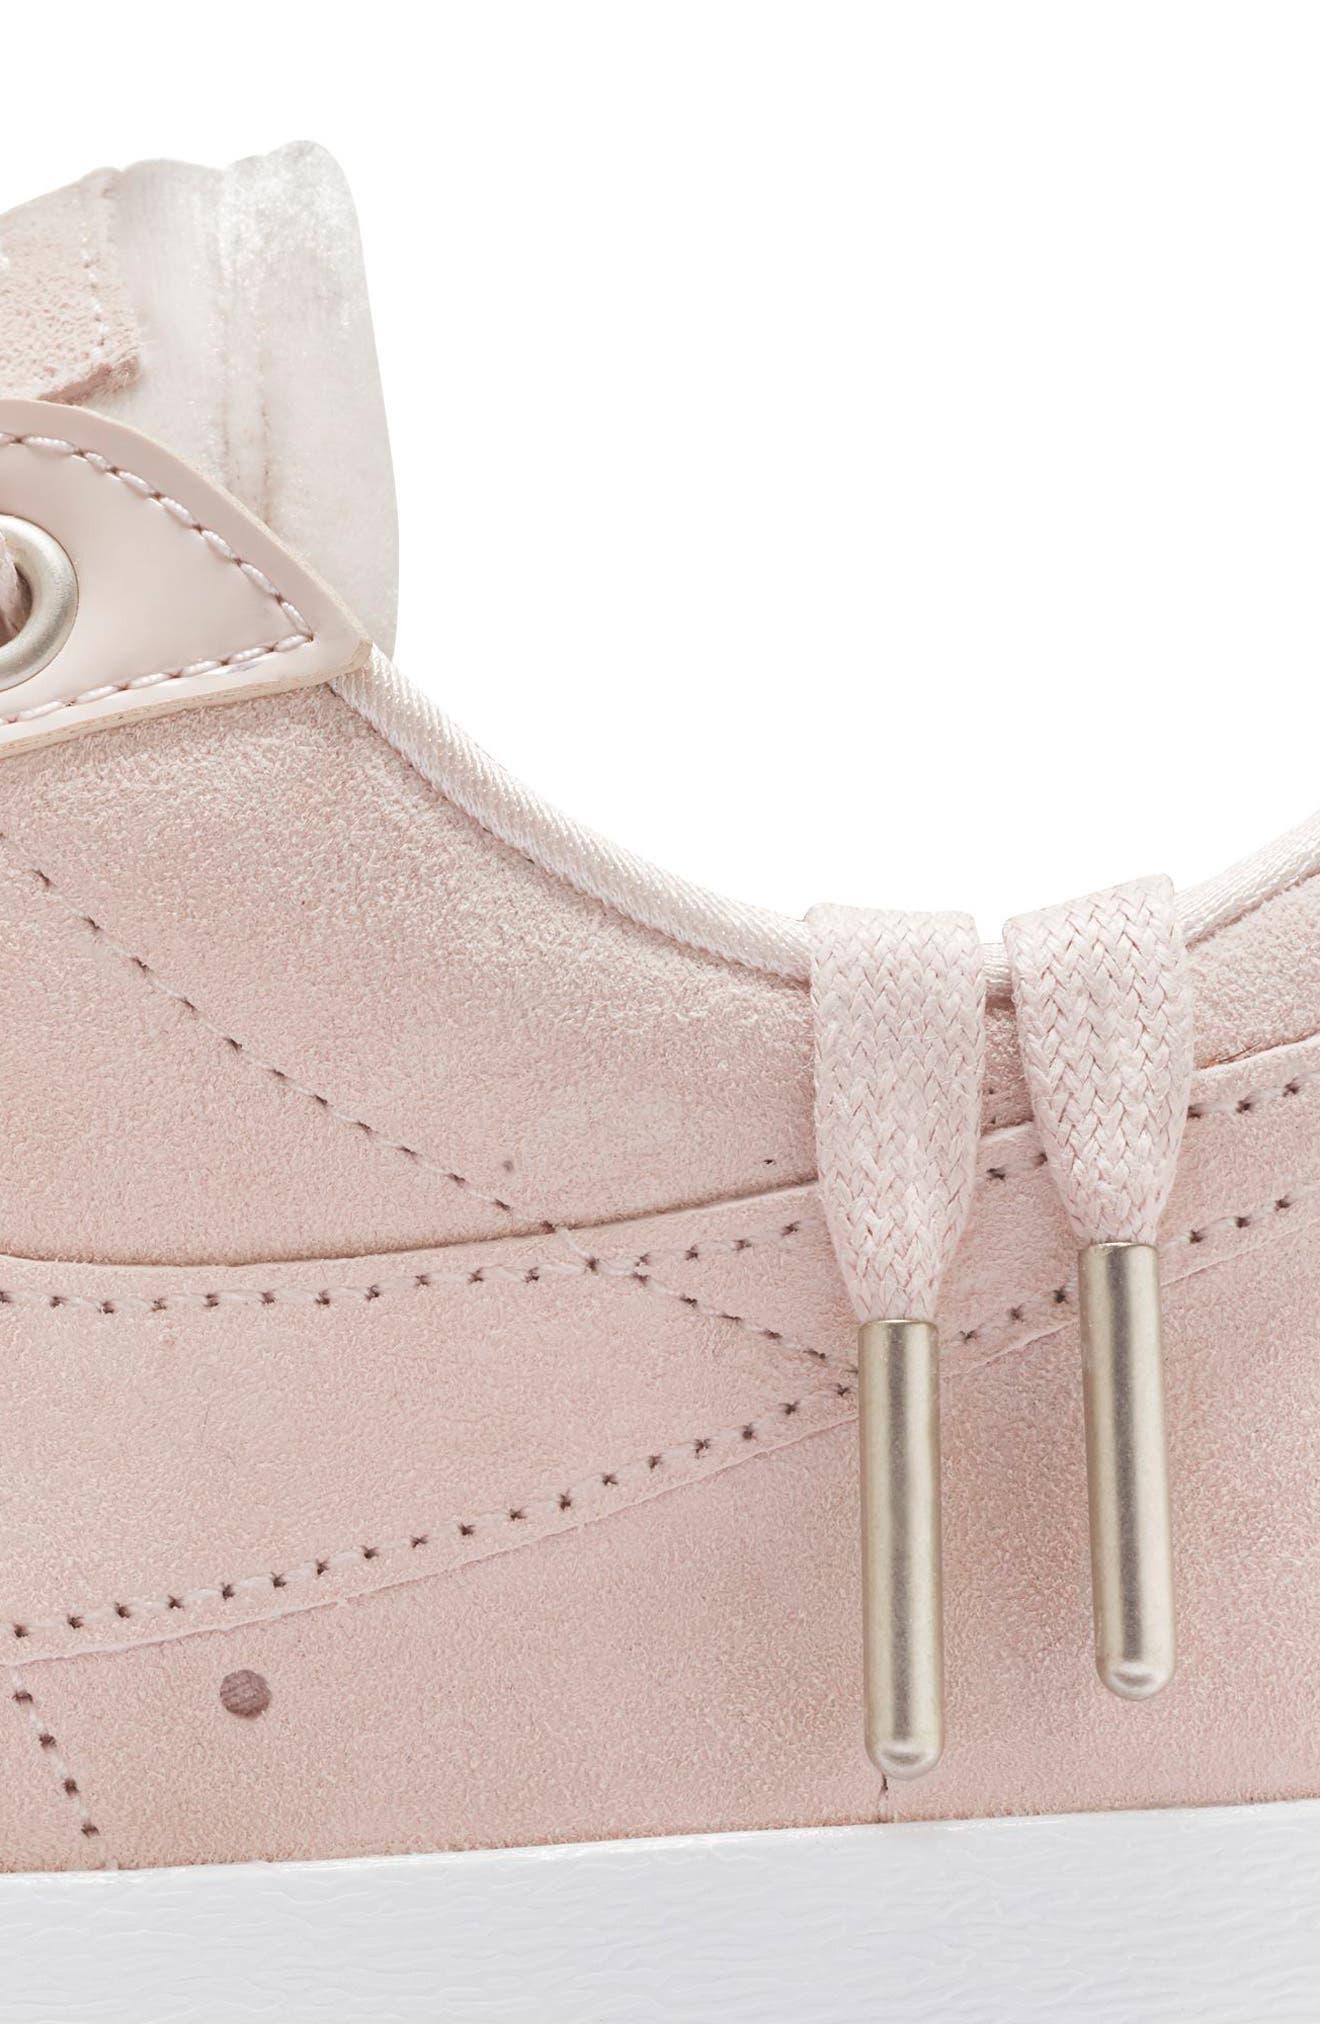 Blazer Low LX Sneaker,                             Alternate thumbnail 5, color,                             Silt Red/ Brown/ White